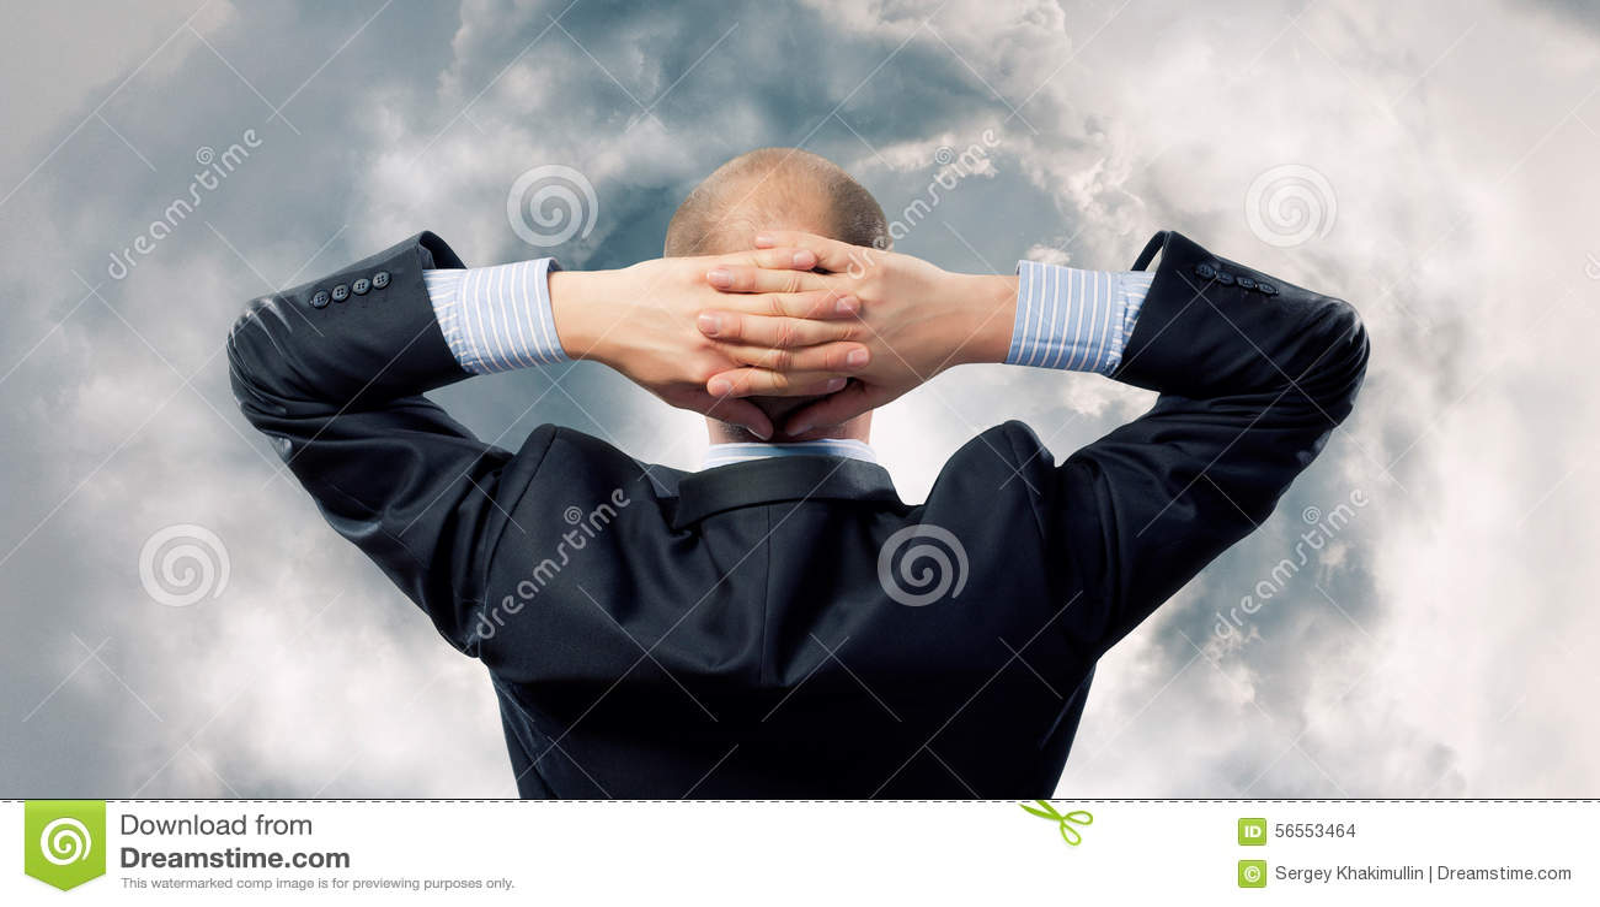 Download Επιχειρηματίας και πετώντας γρίφος Στοκ Εικόνες - εικόνα από μπακαράδων, κίνδυνος: 56553464